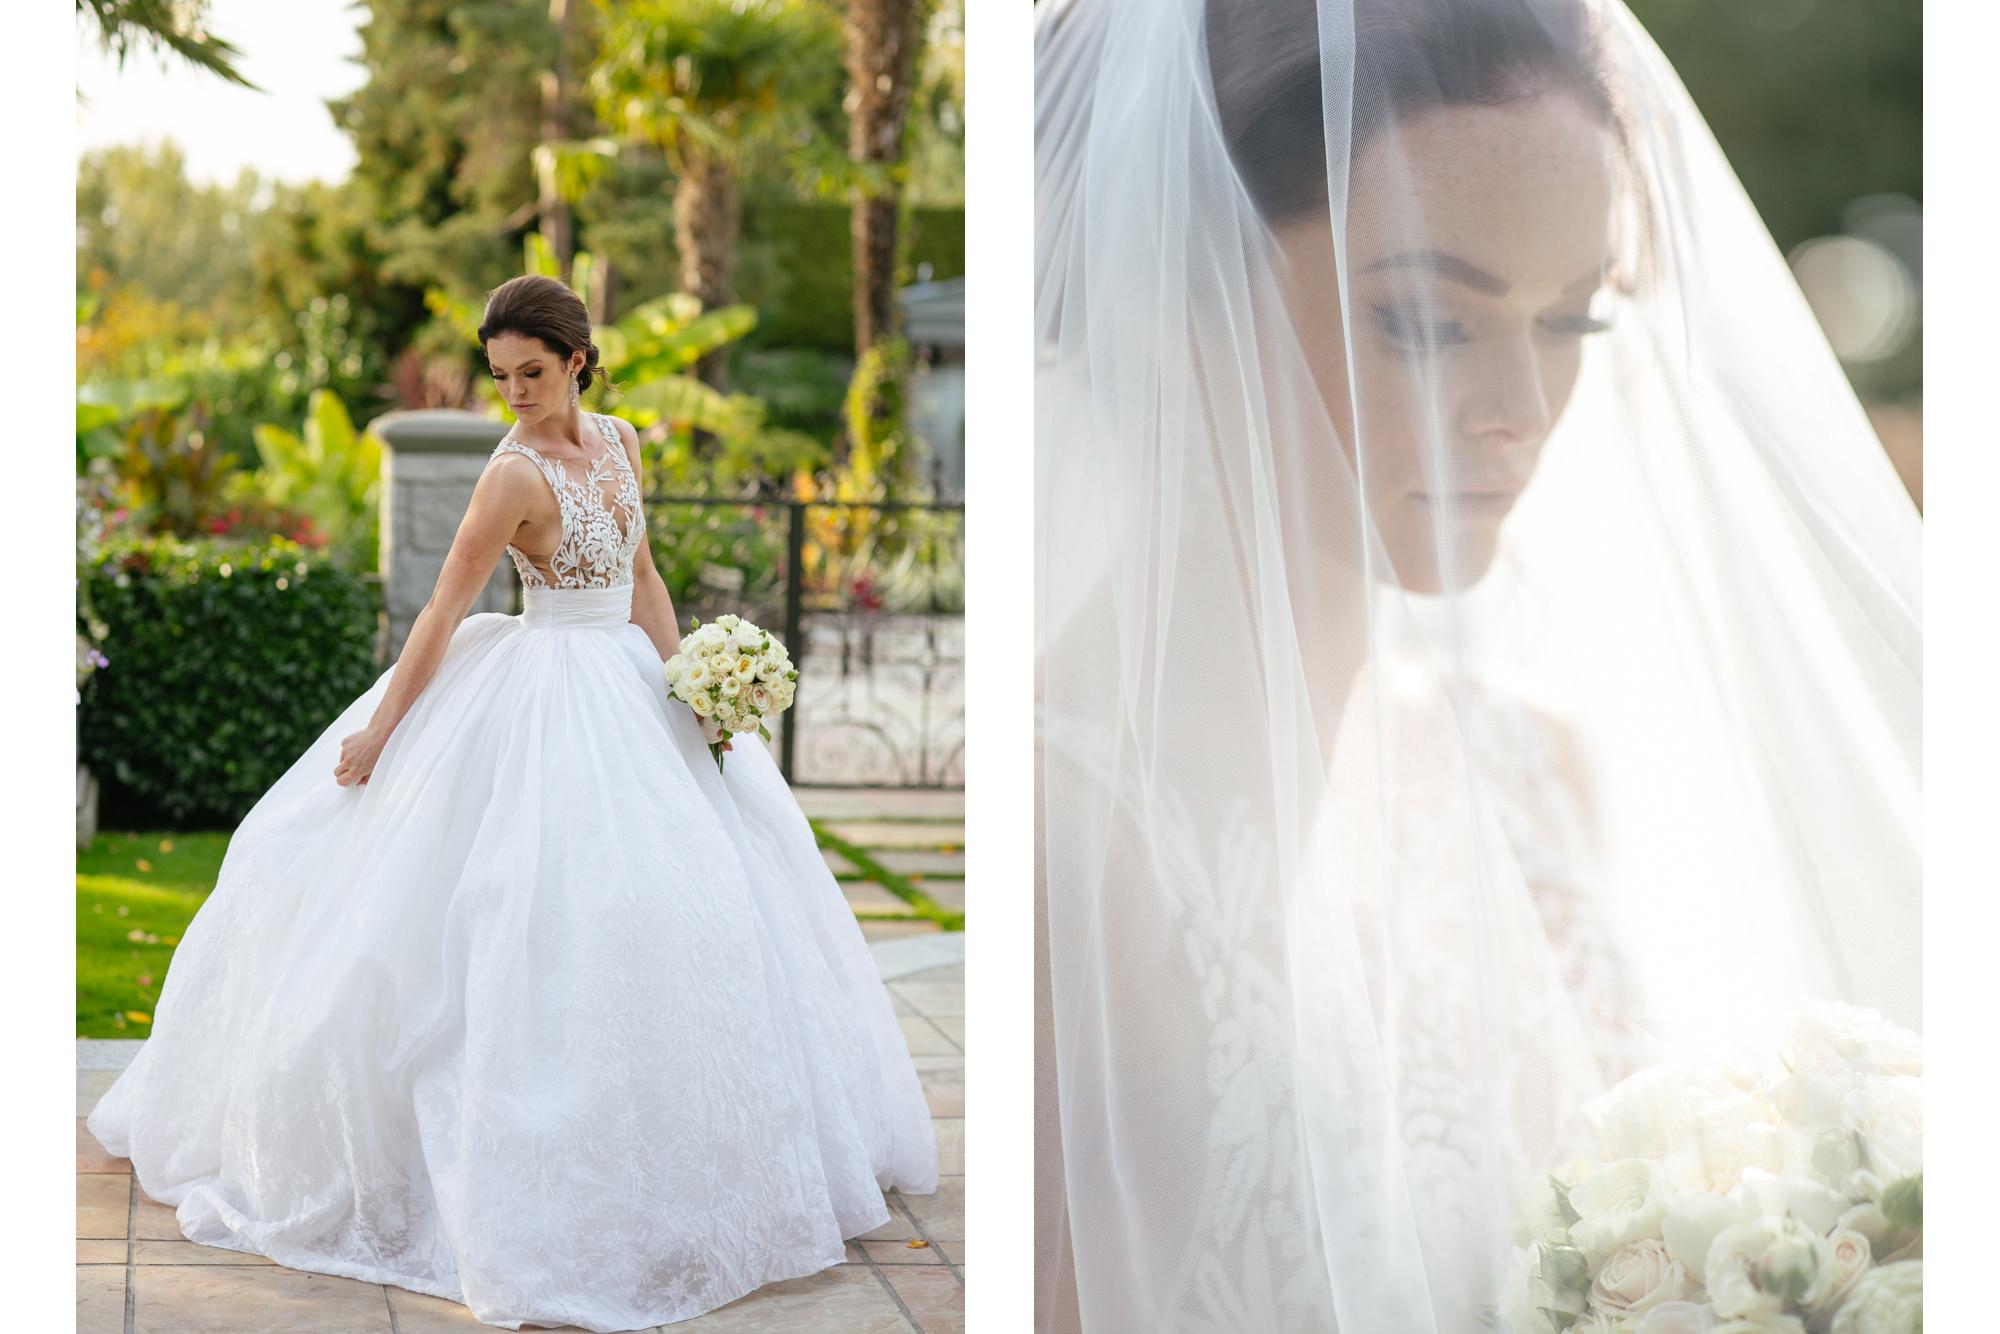 vancouver-luxury-wedding-photographer-lori-miles-20.jpg